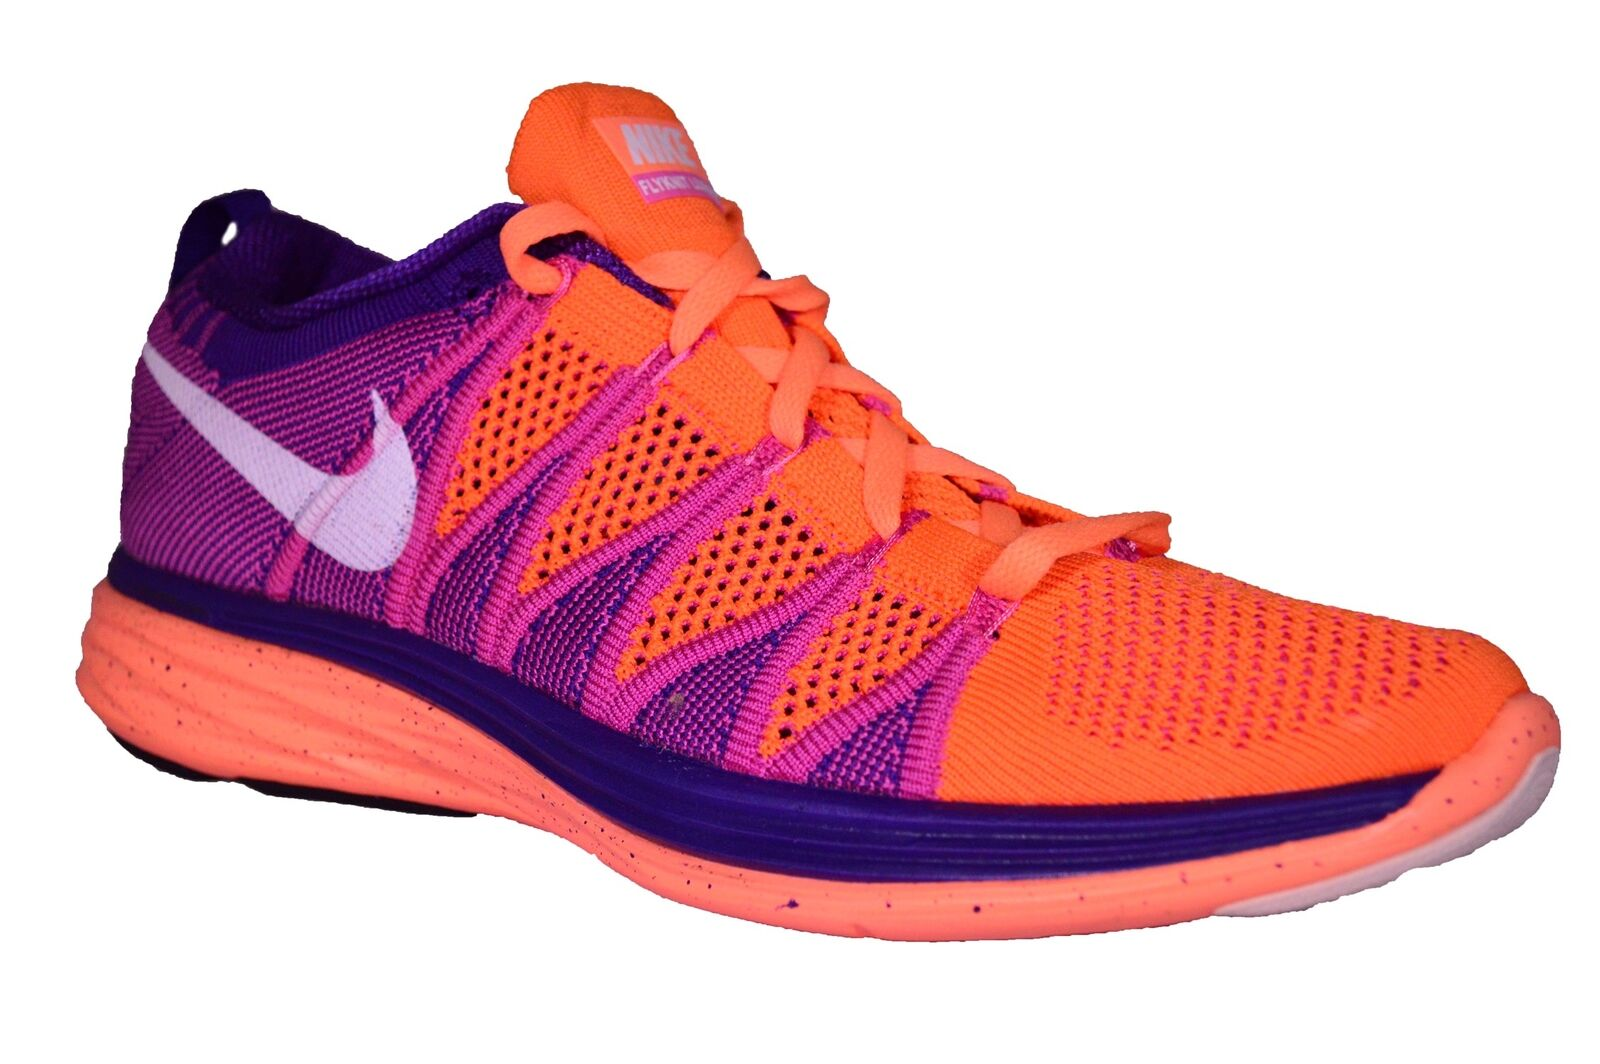 New NIKE Women's orange Flyknit Lunar 2 Running shoes Athletic Training Sneakers